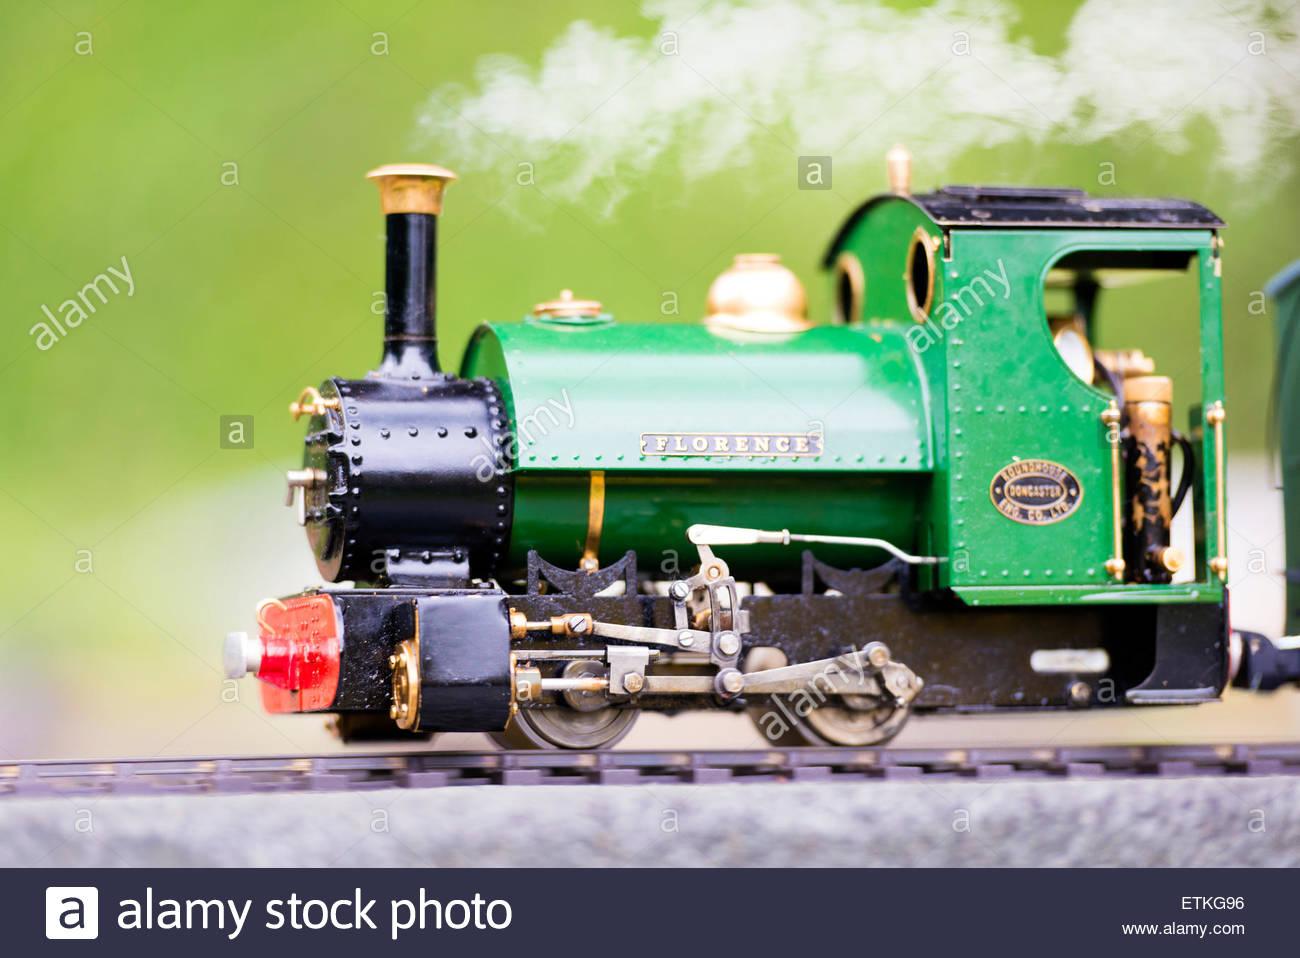 Hereford Society of Model Engineers model steam train railway loco. Stock Photo